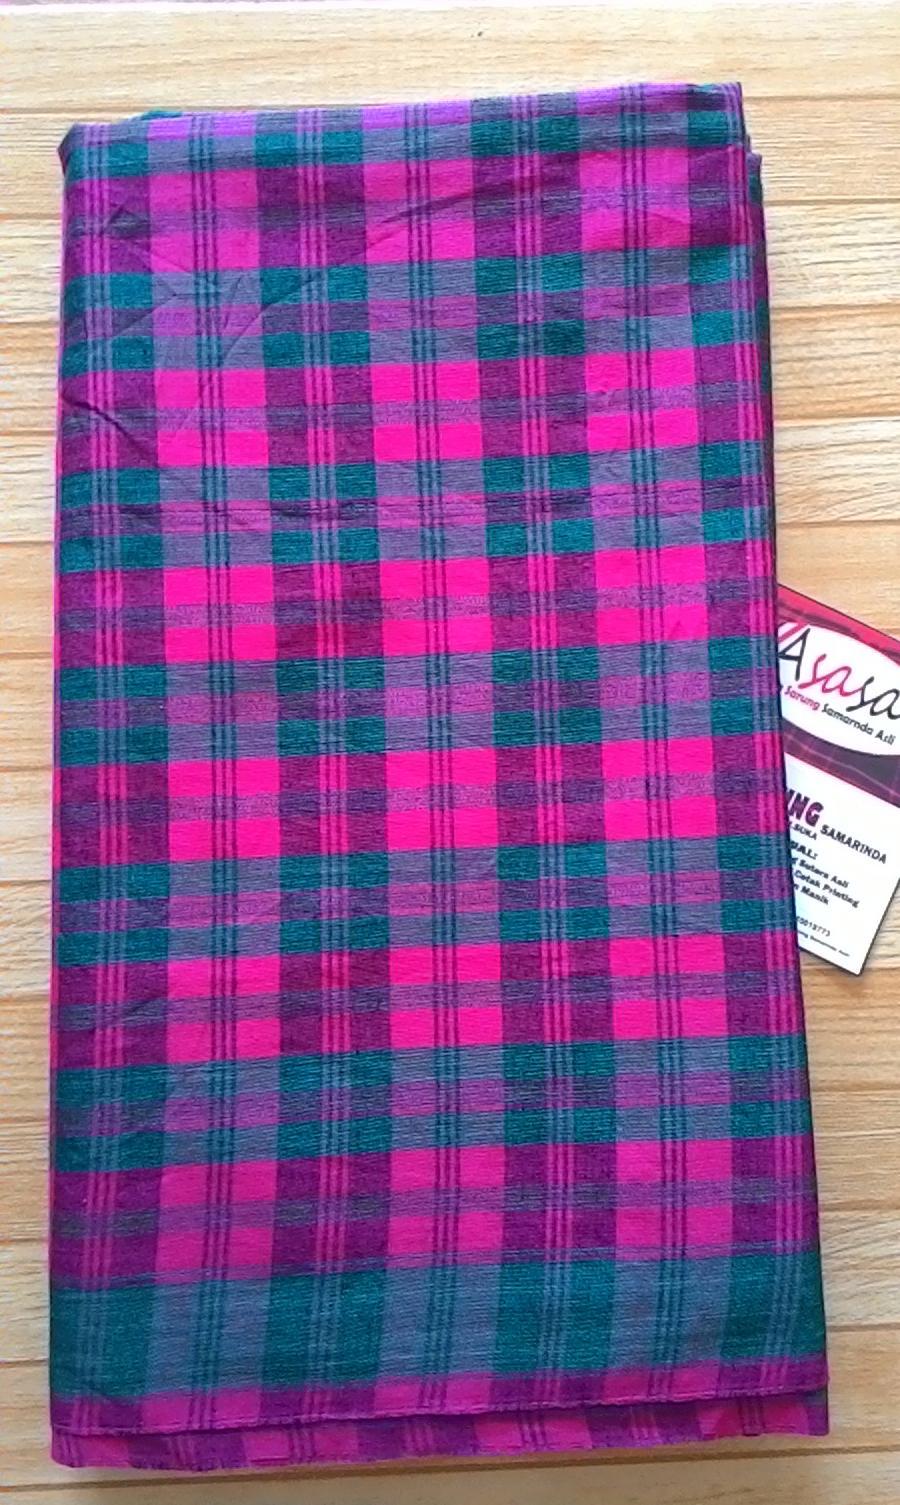 Sarung Tenun Samarinda (Motif Soeharto) kombinasi pink + hijau